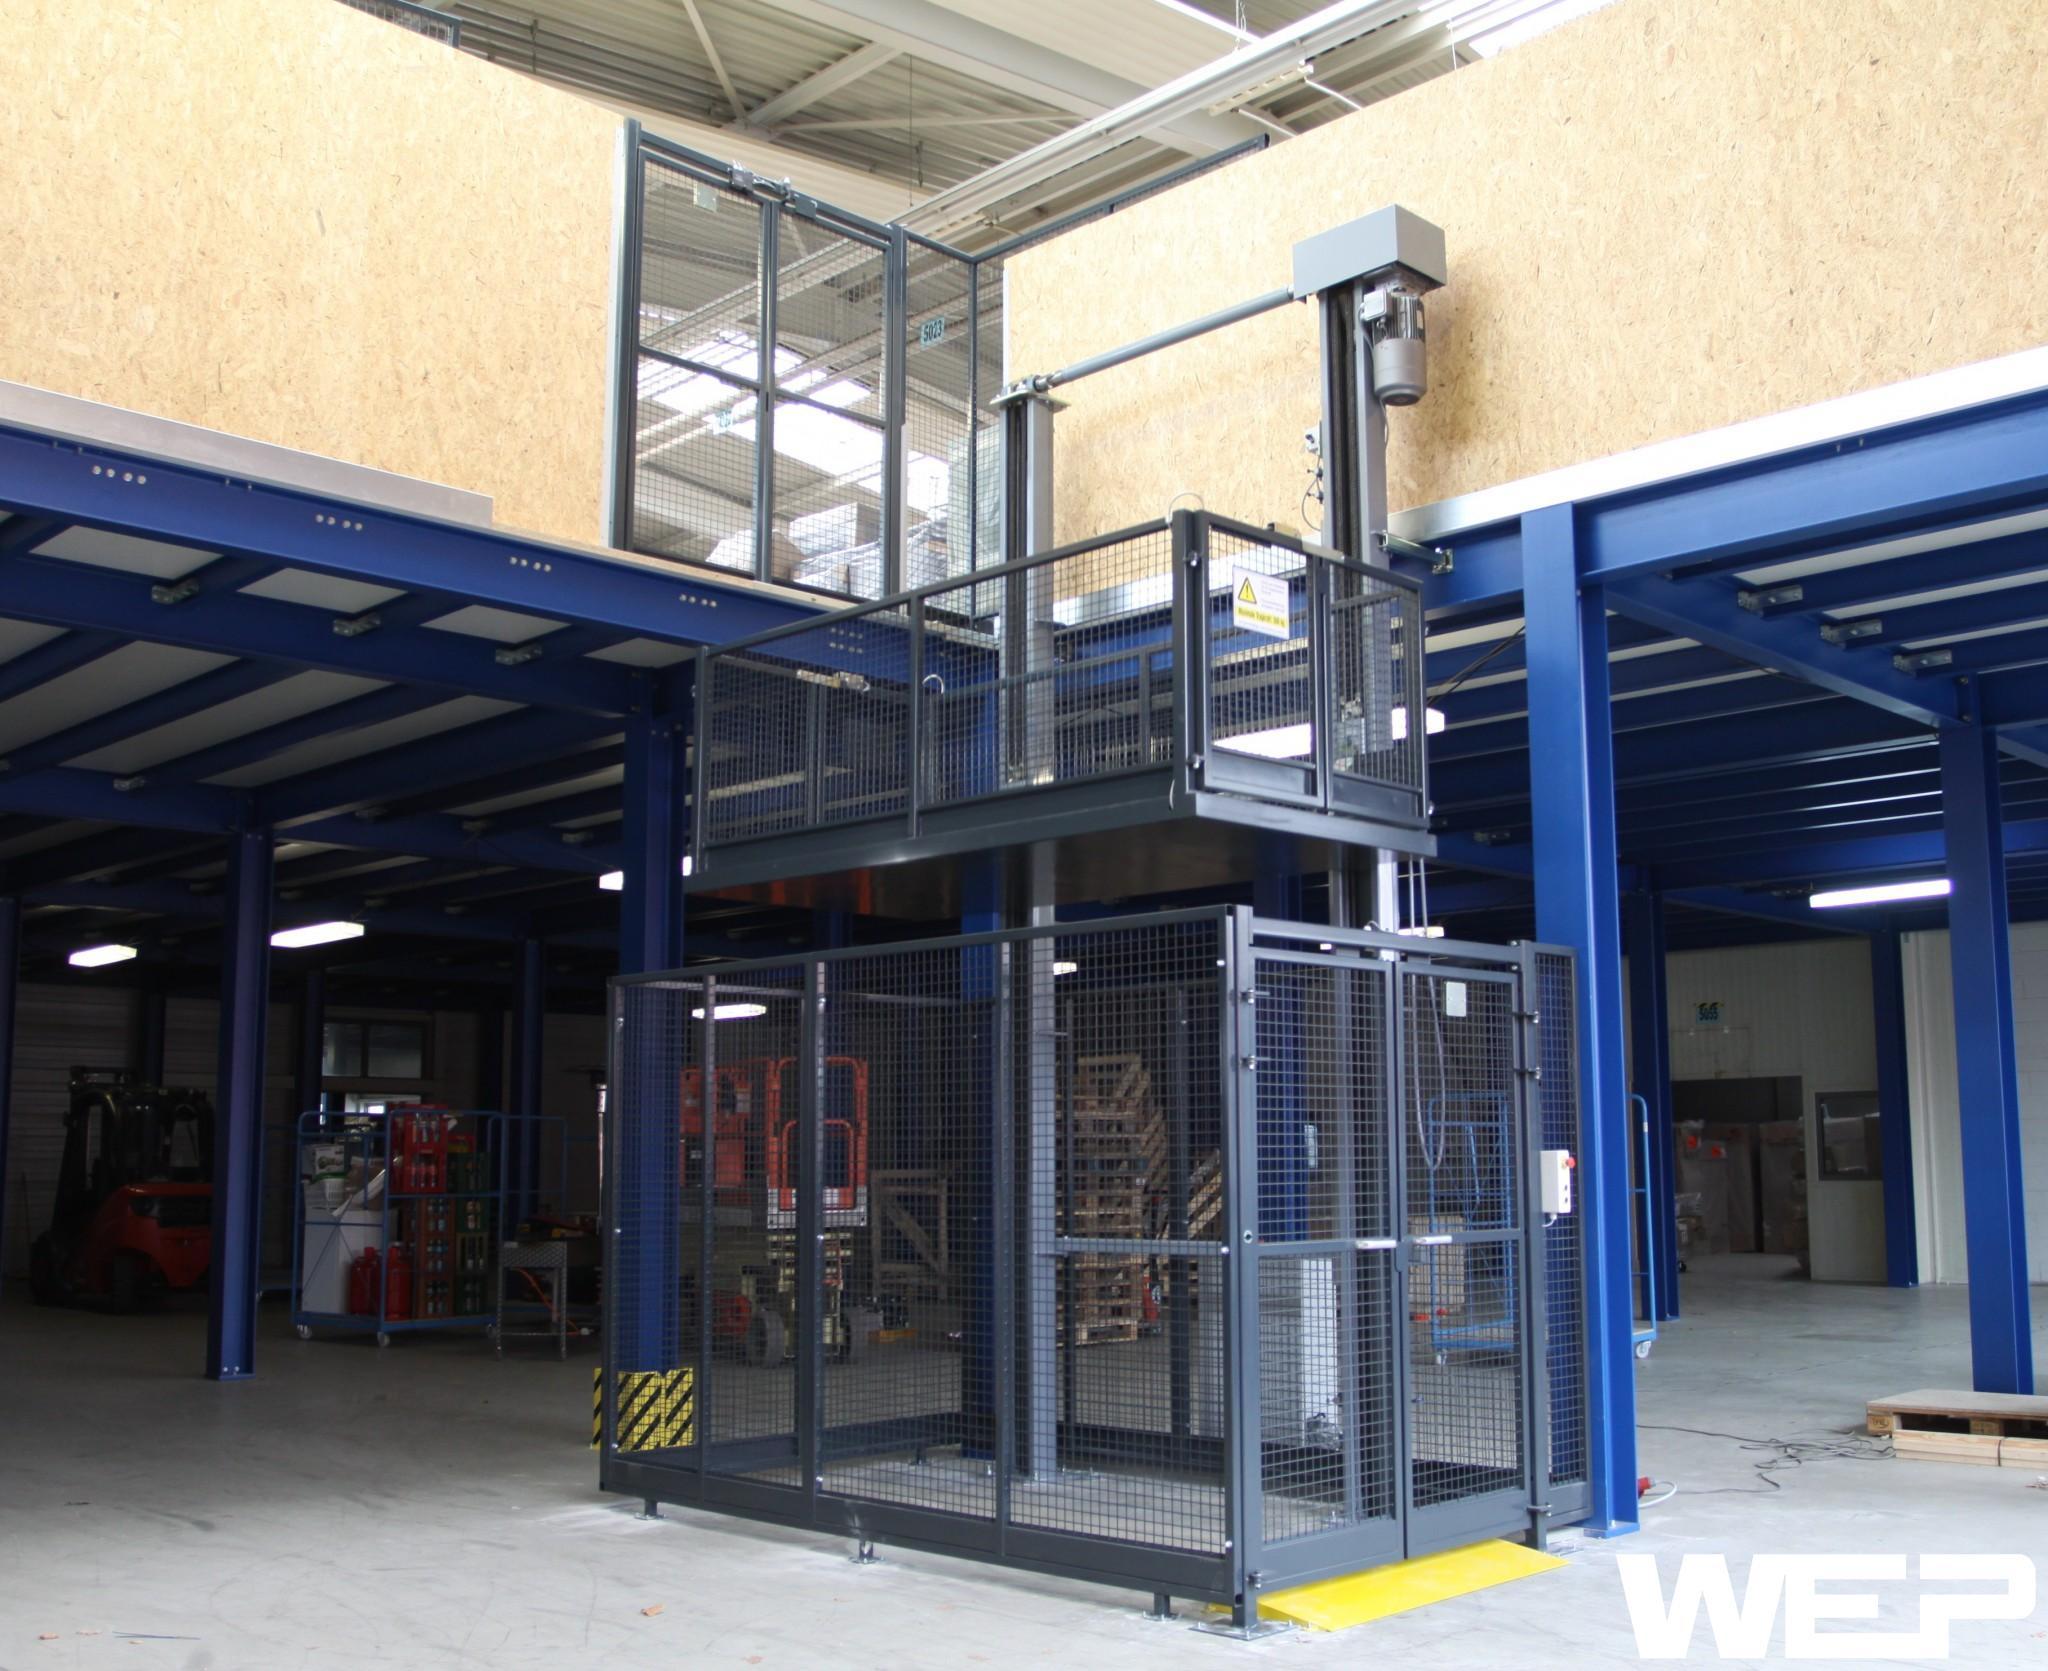 Lastenaufzug Lasten Aufzug Lastenlift Aufzug preis Reifen lift Reifenlift Materiallift Etagenlift Etagenheber Lastenheber ZSL Pro 15